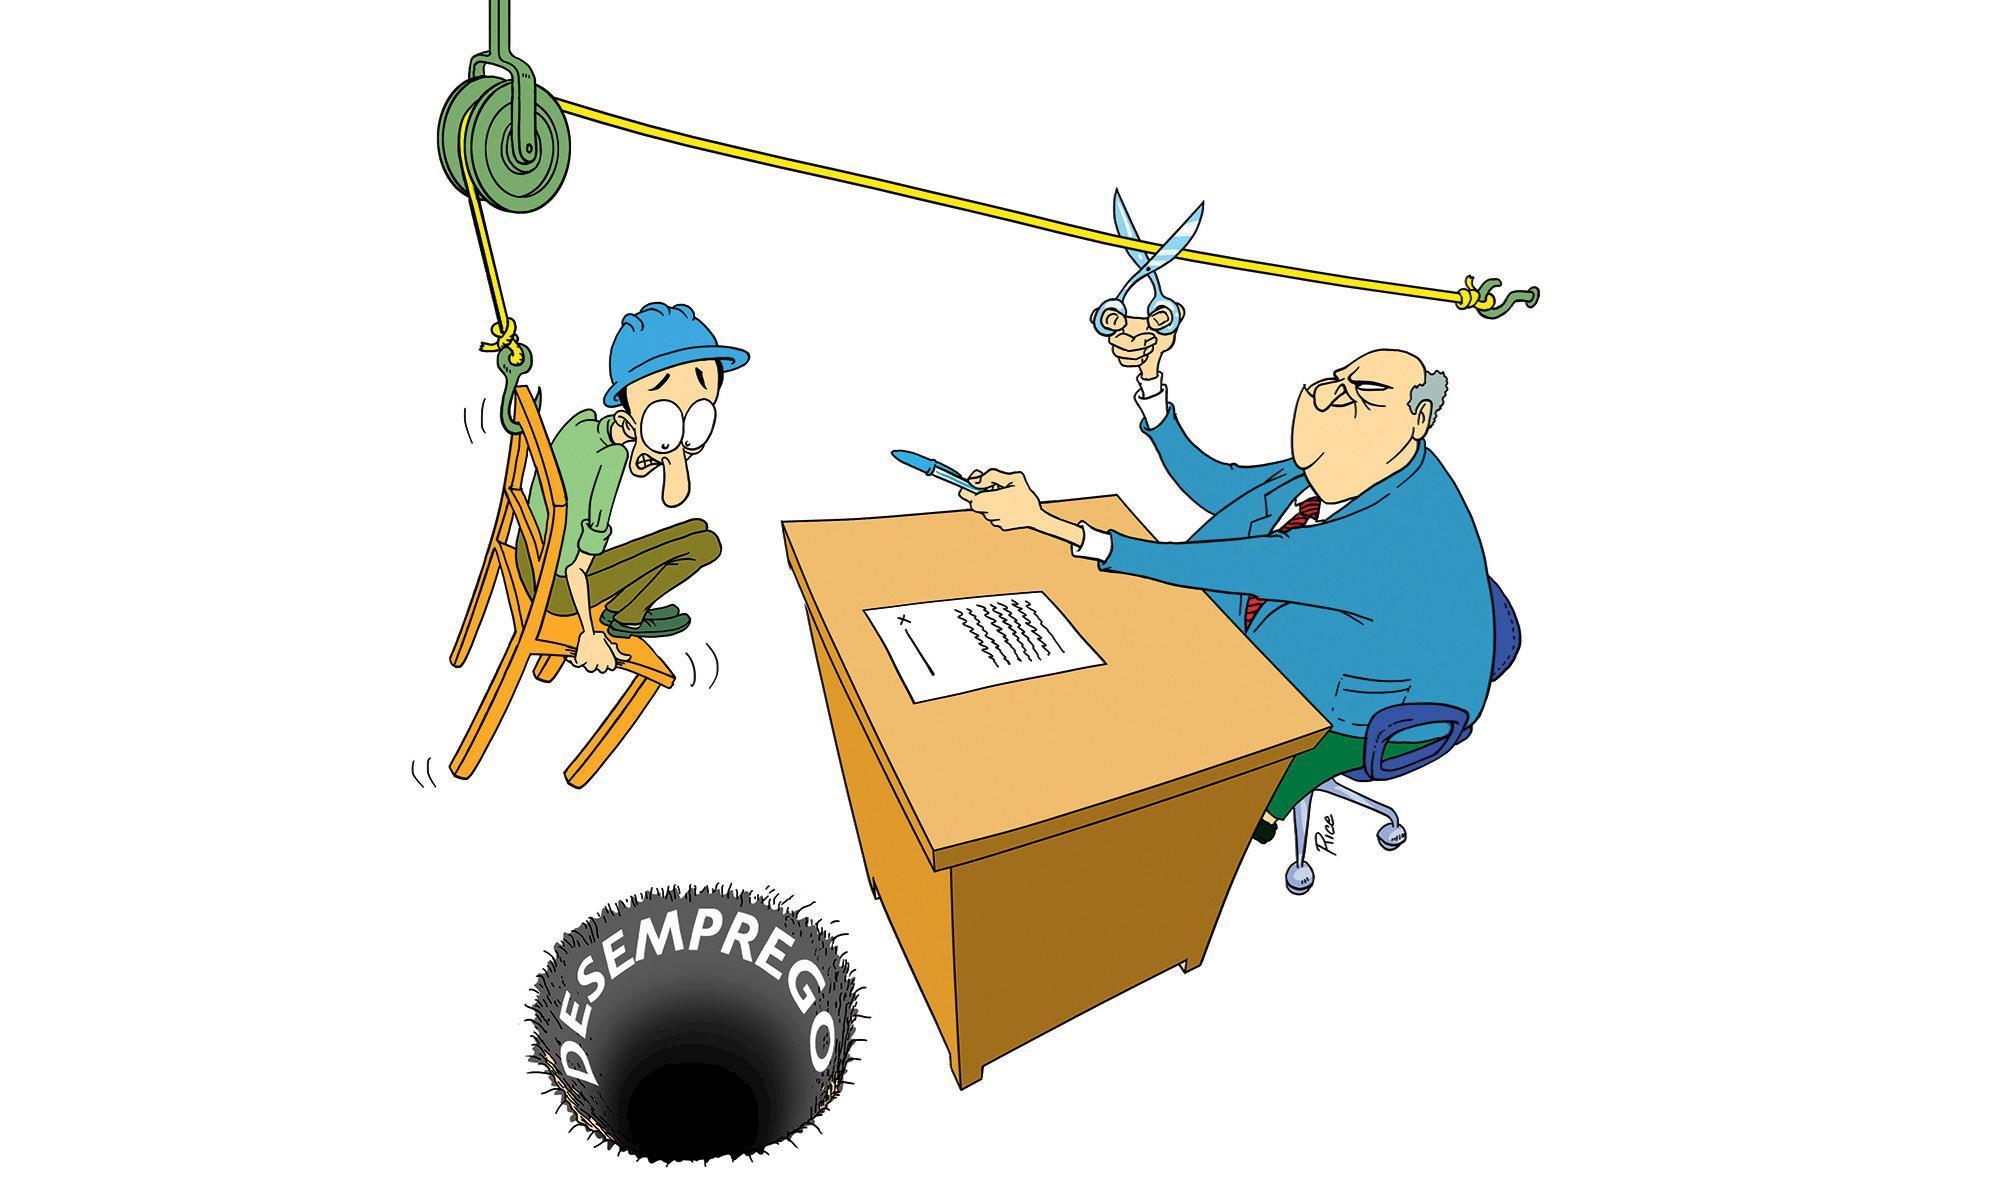 desemprego, informalidade, trabalhador, mp, rice, emprego, charge, Arte: Rice